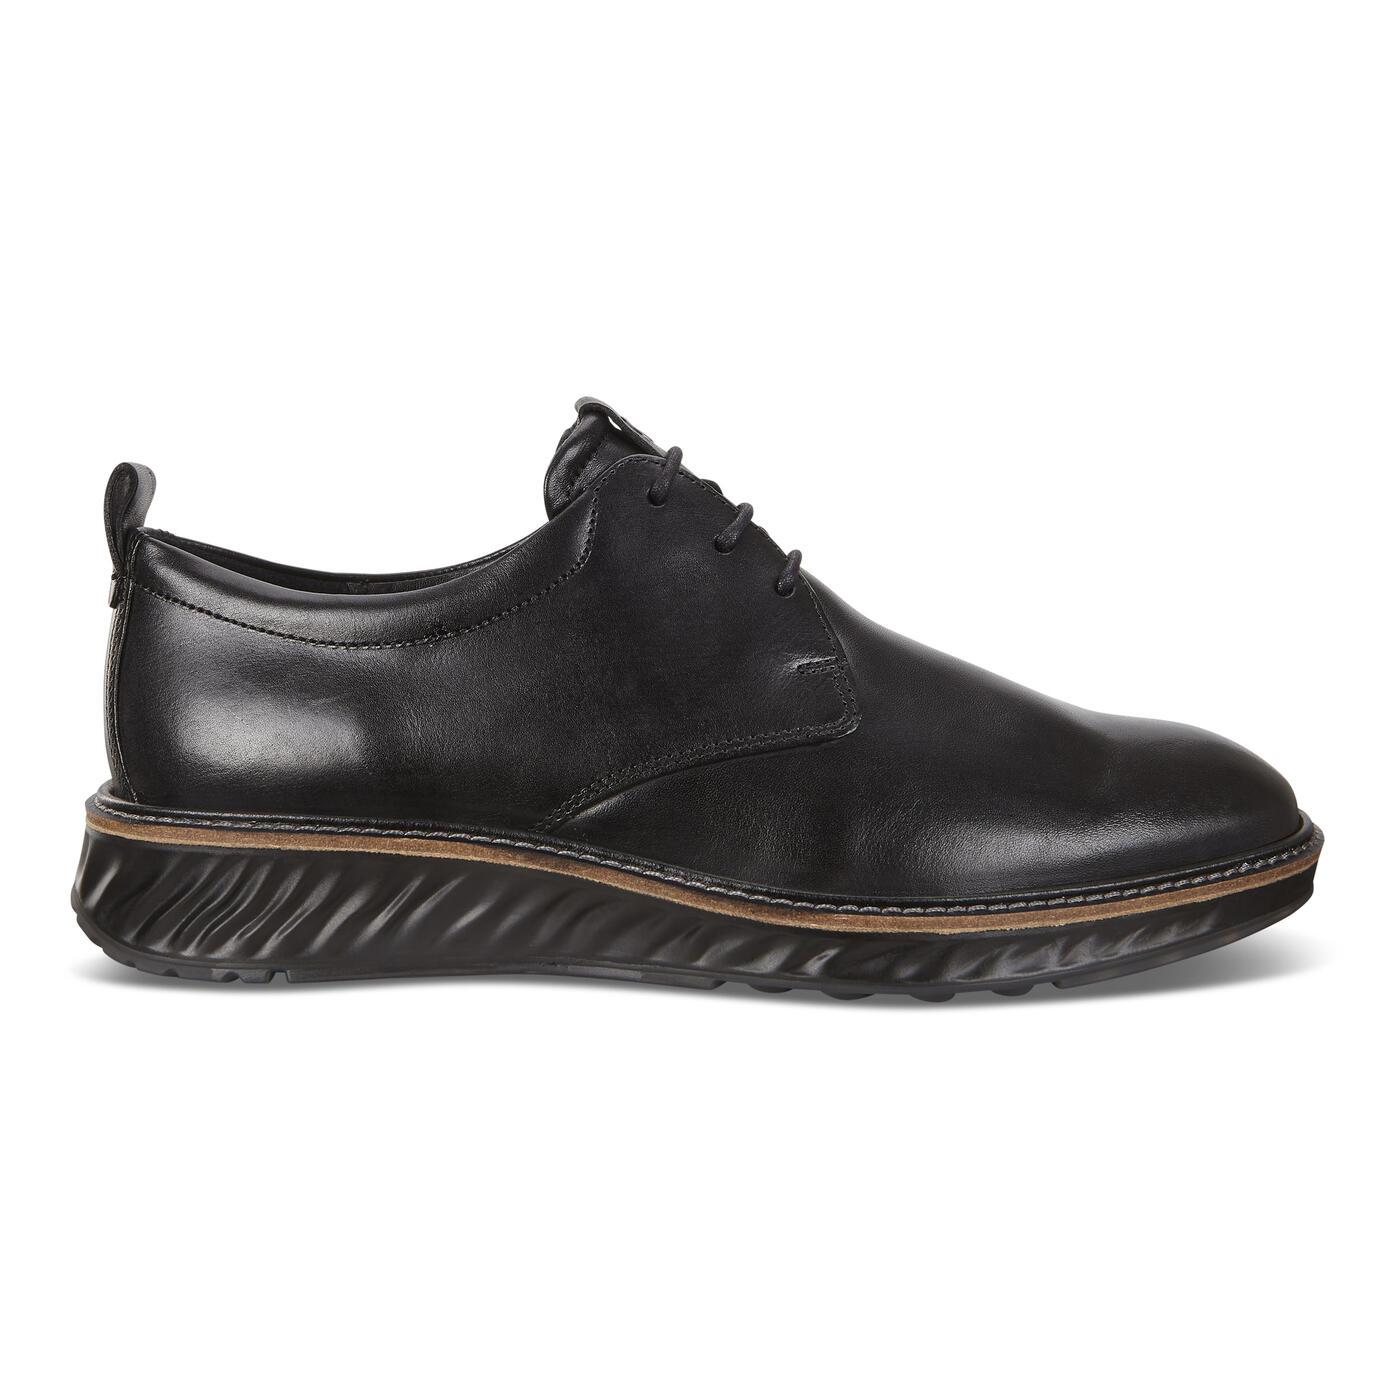 ECCO ST.1 Hybrid Derby Shoes